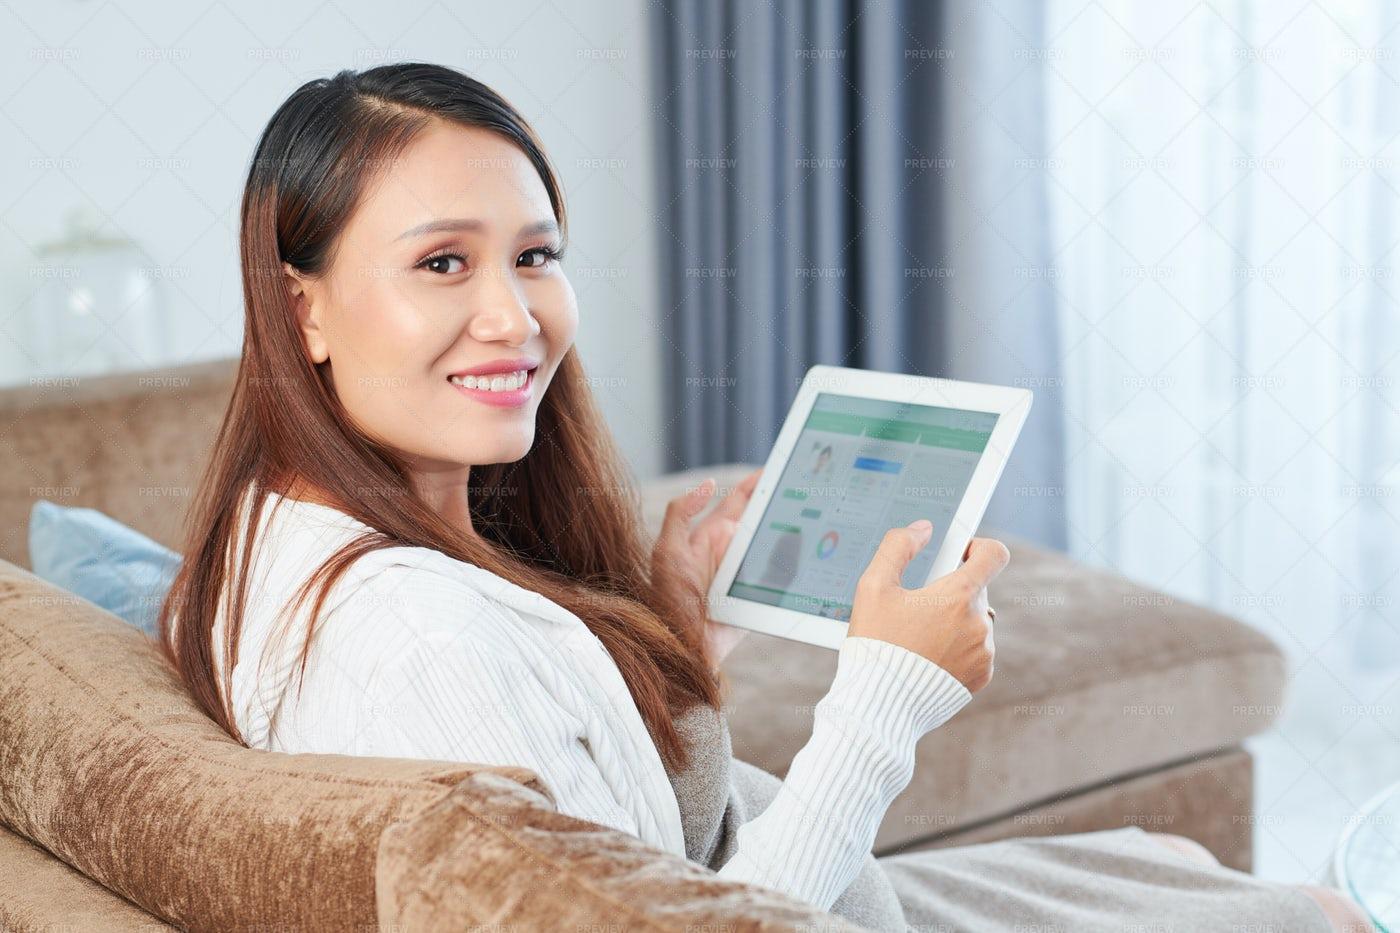 Cheerful Woman Checking Health App: Stock Photos